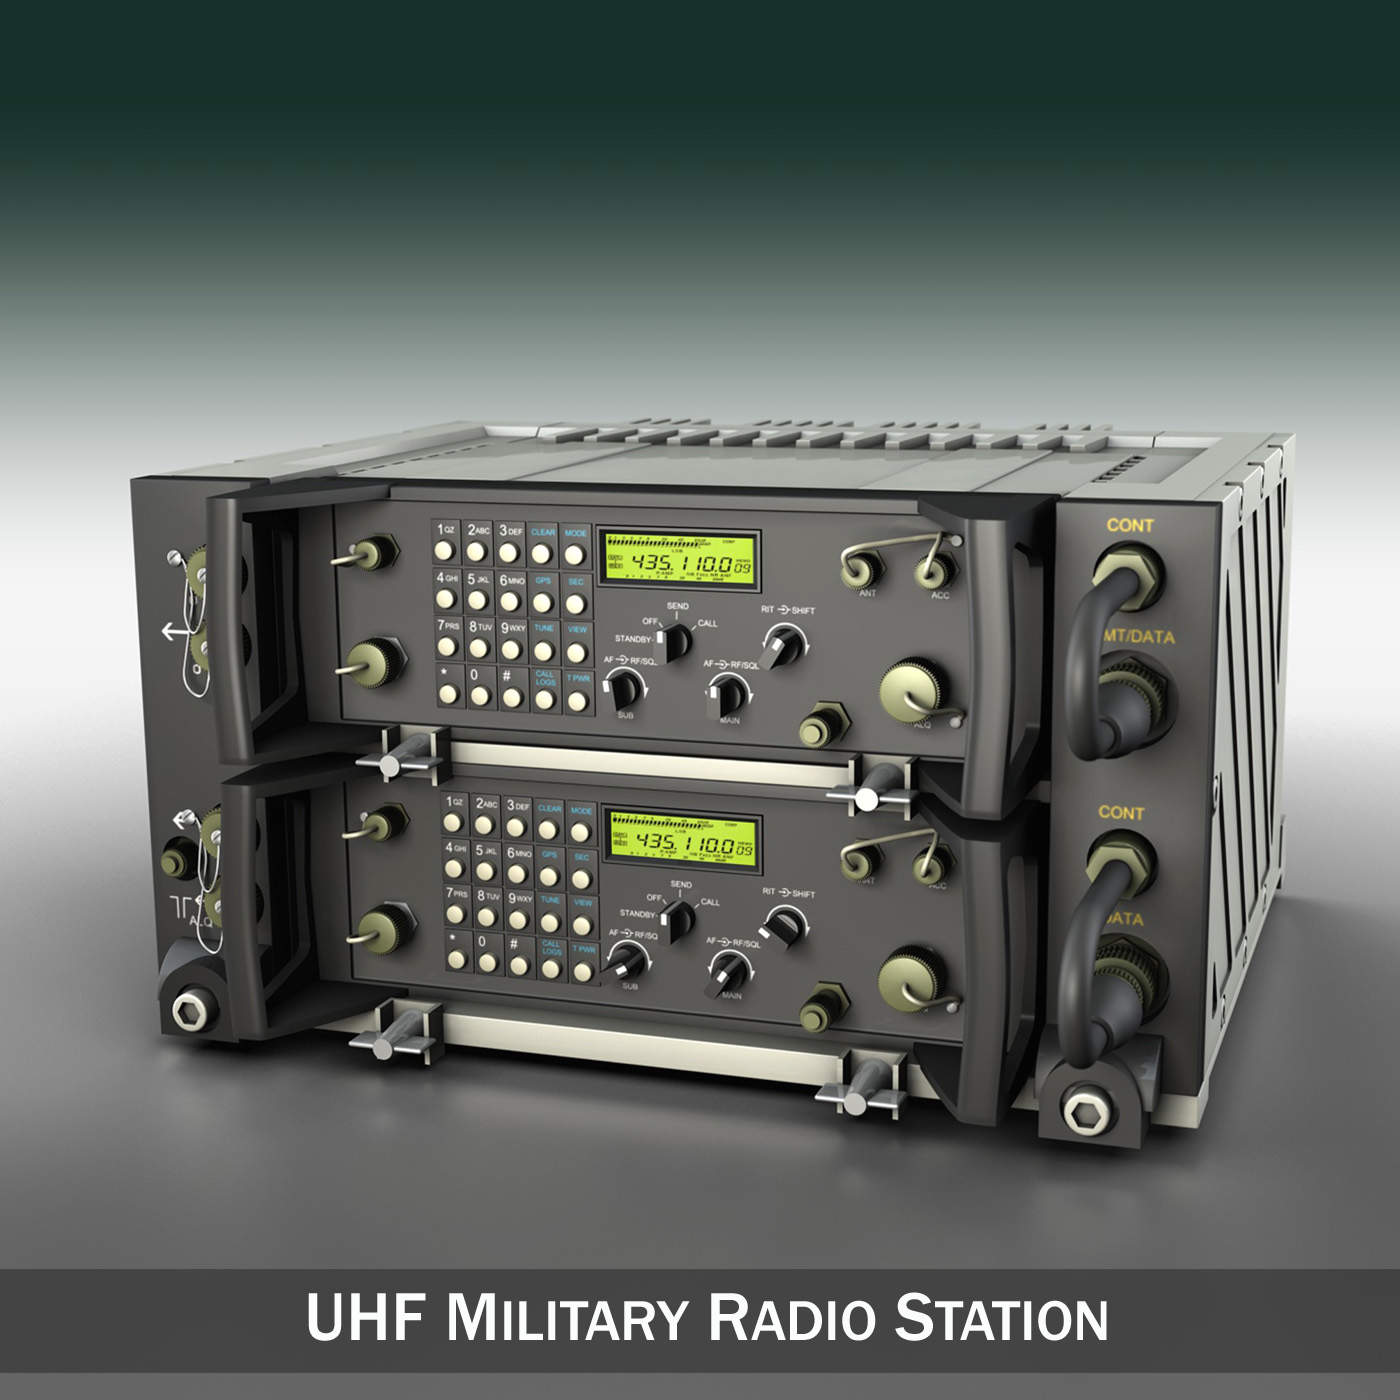 UHF Military radio system 3d model 3ds fbx c4d lwo lws lw obj 189364